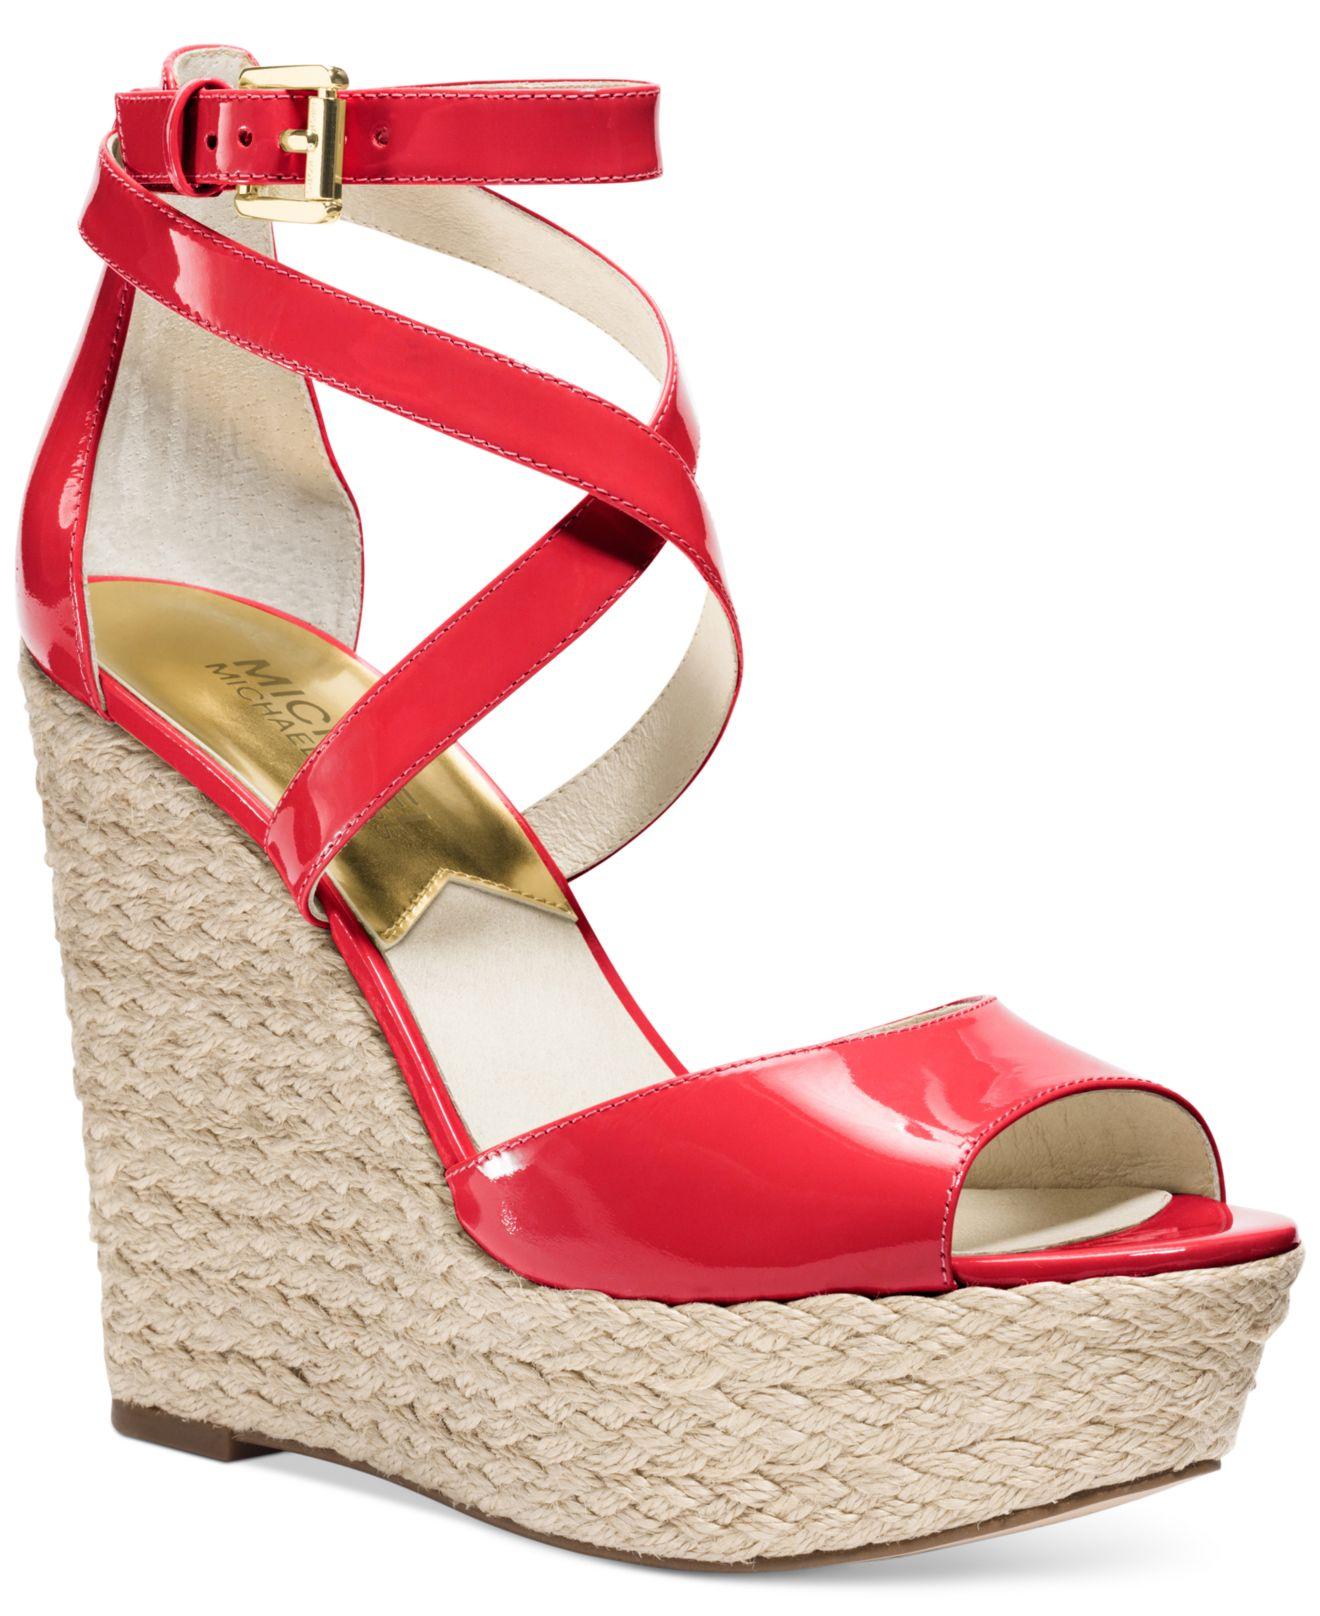 5a4c11f27e0 Lyst - Michael Kors Michael Gabriella Platform Wedge Sandals in Red